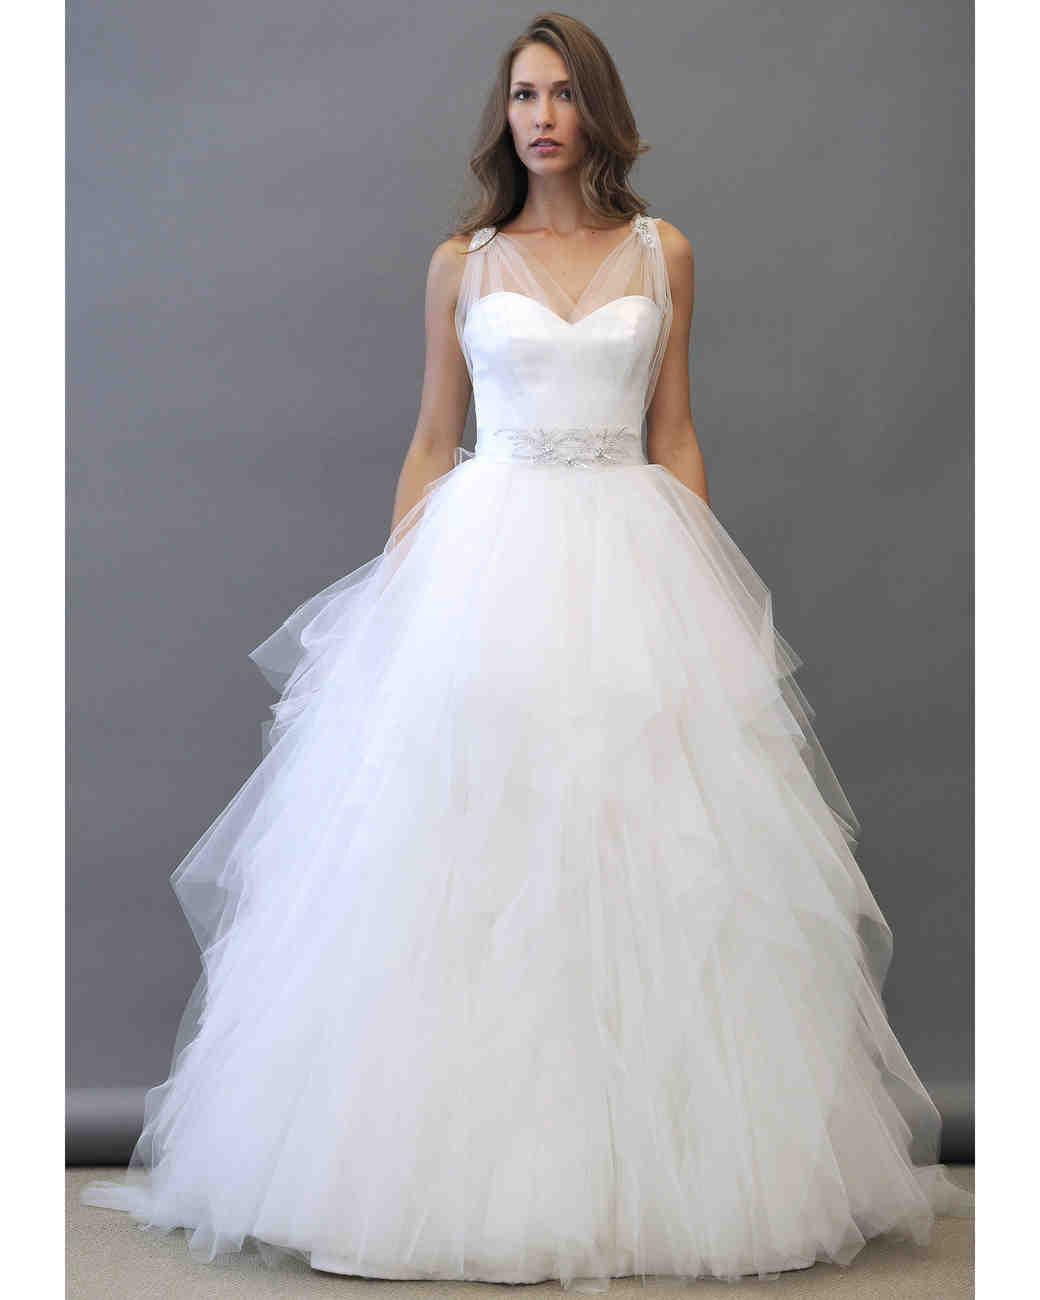 Alvina Valenta Spring 2014 Bridal Gown Collection – Part 4